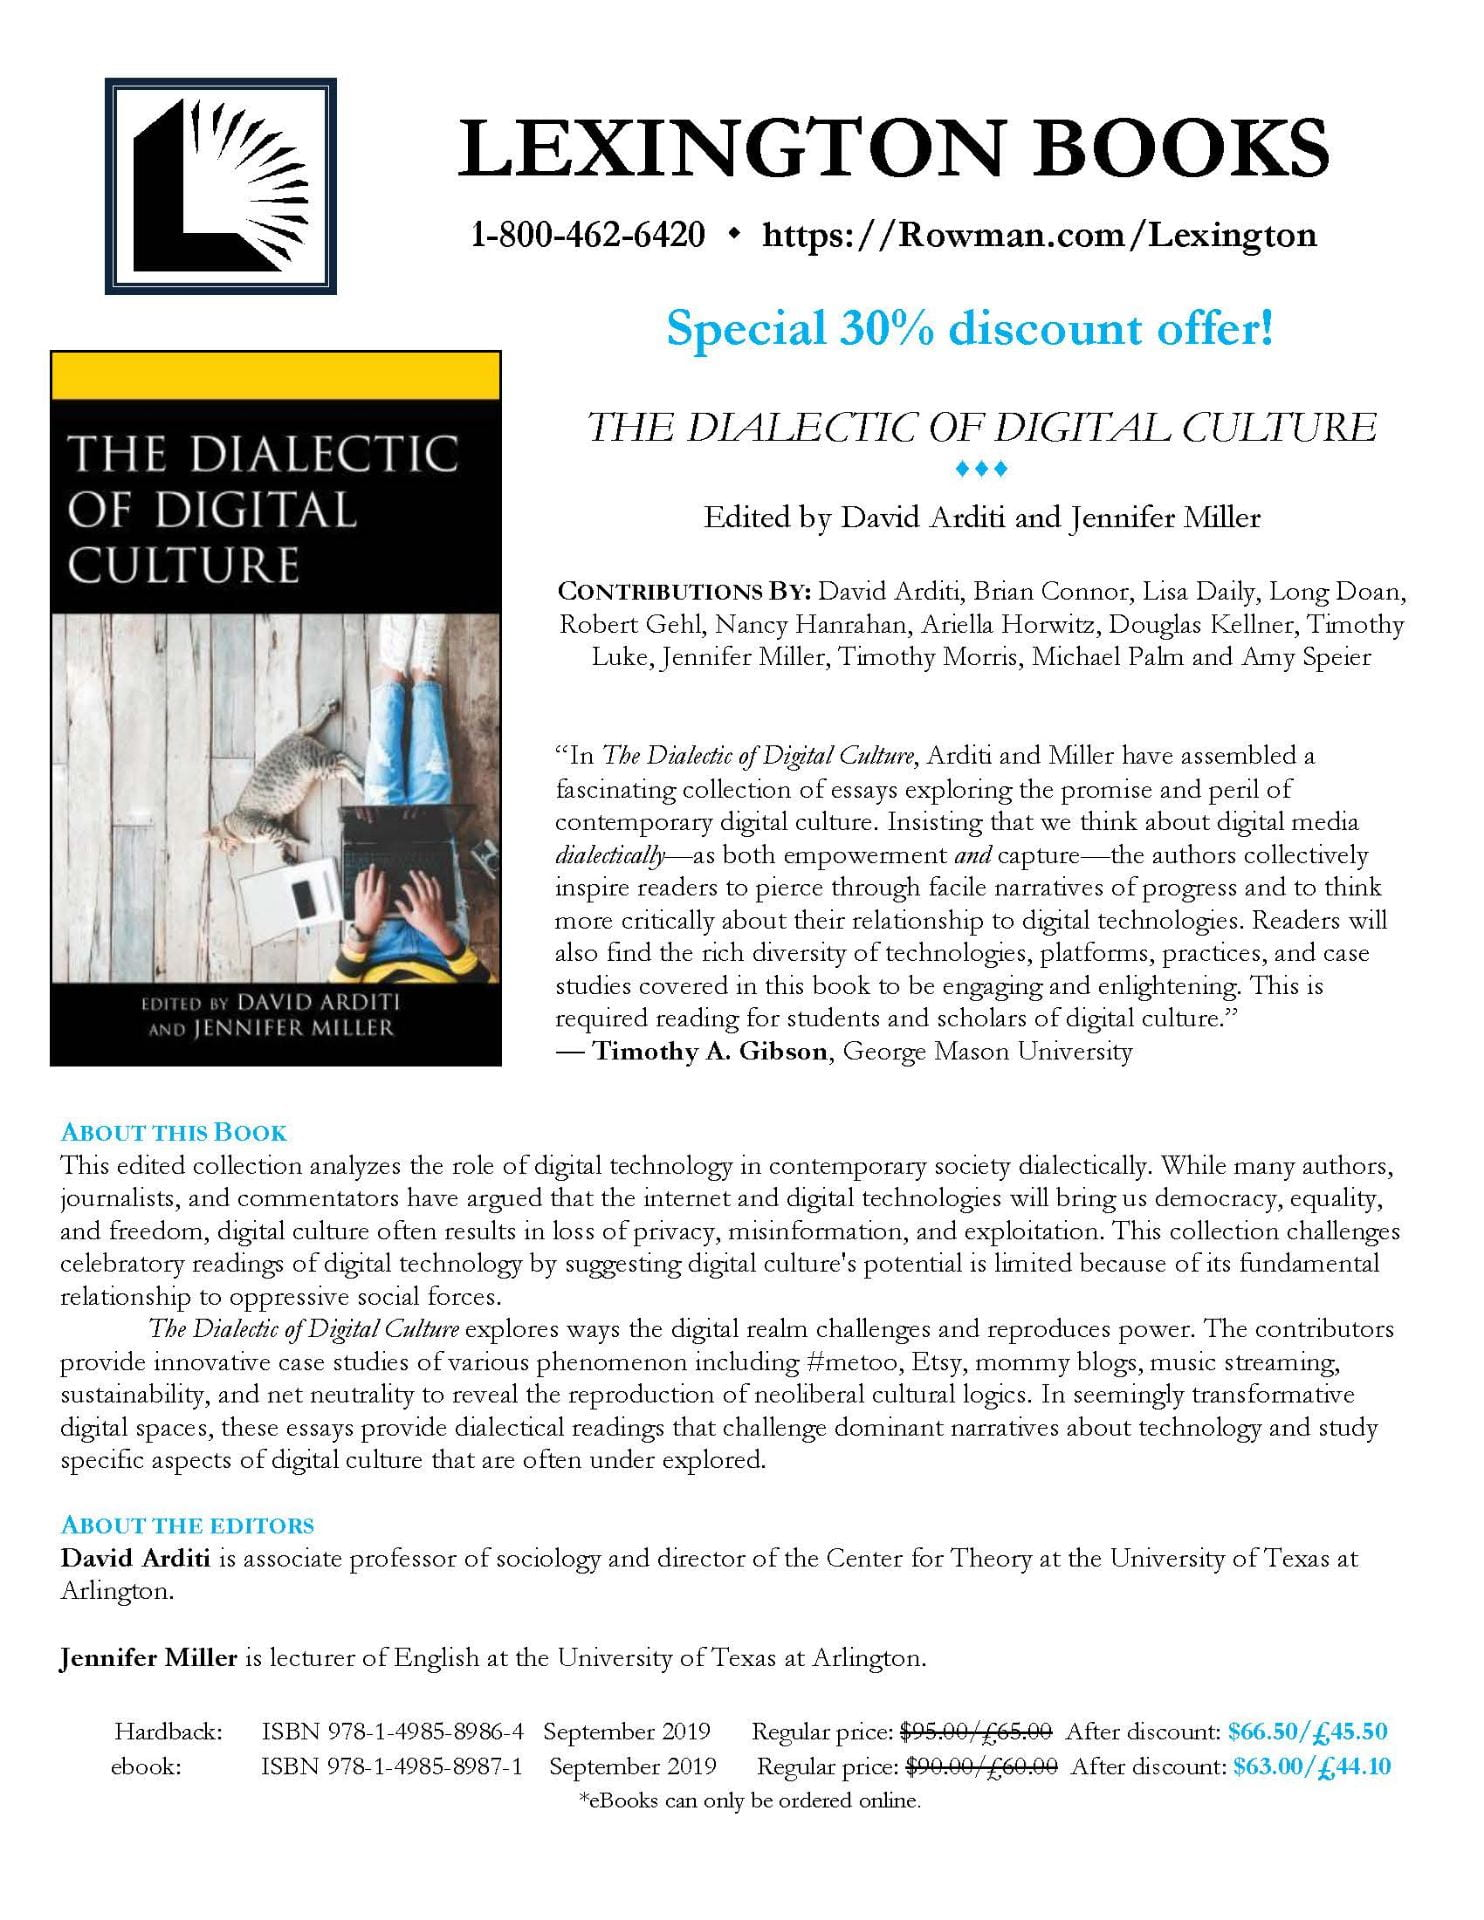 The Dialectic of Digital Culture   Tag   Lexington Books